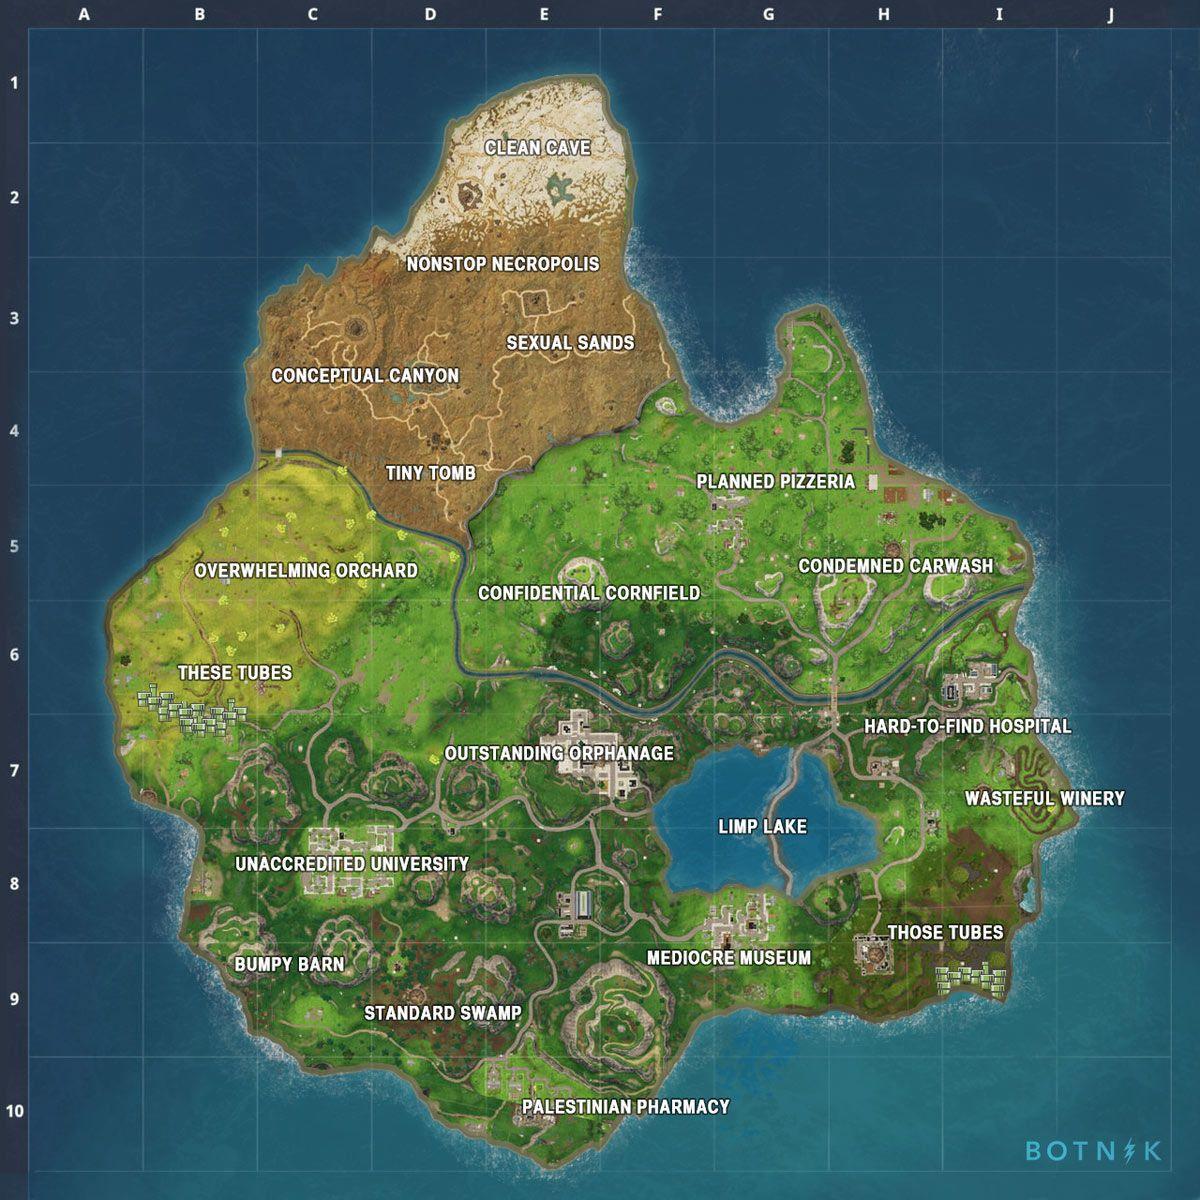 The Fortnite Map according to Botnik Studios' Alliterative